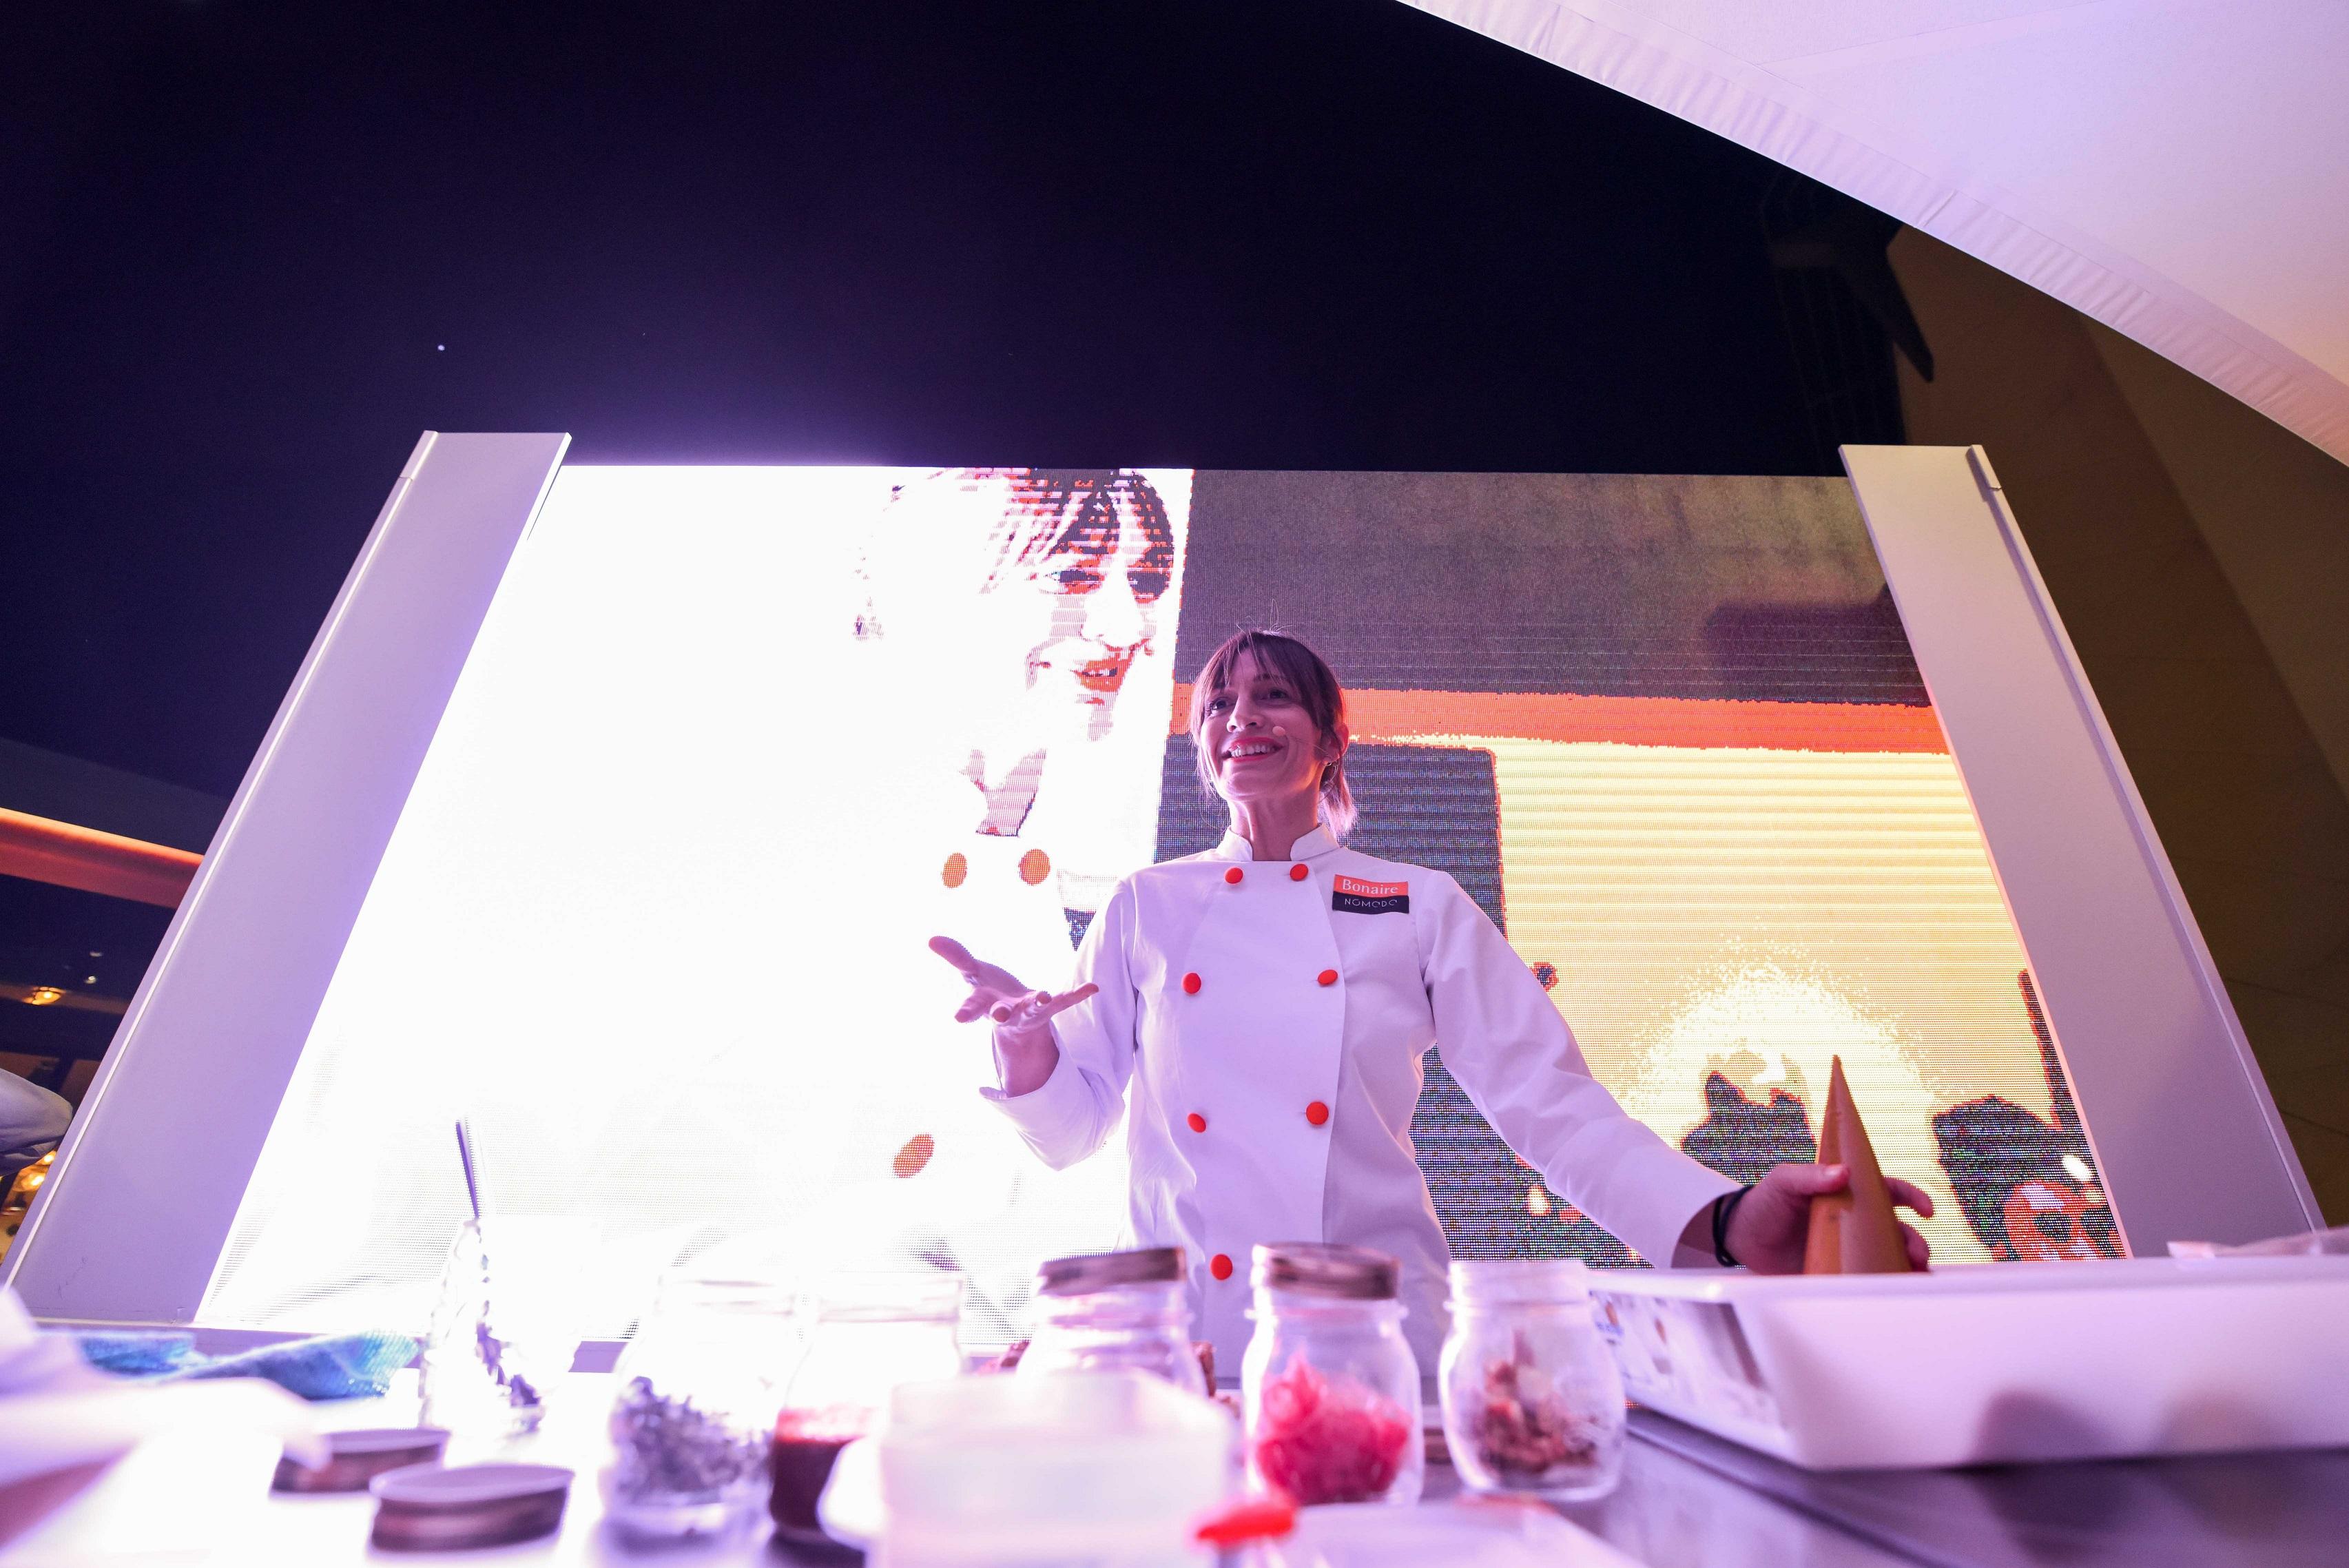 Las terrazas de Bonaire acogen un showcooking con Begoña Rodrigo